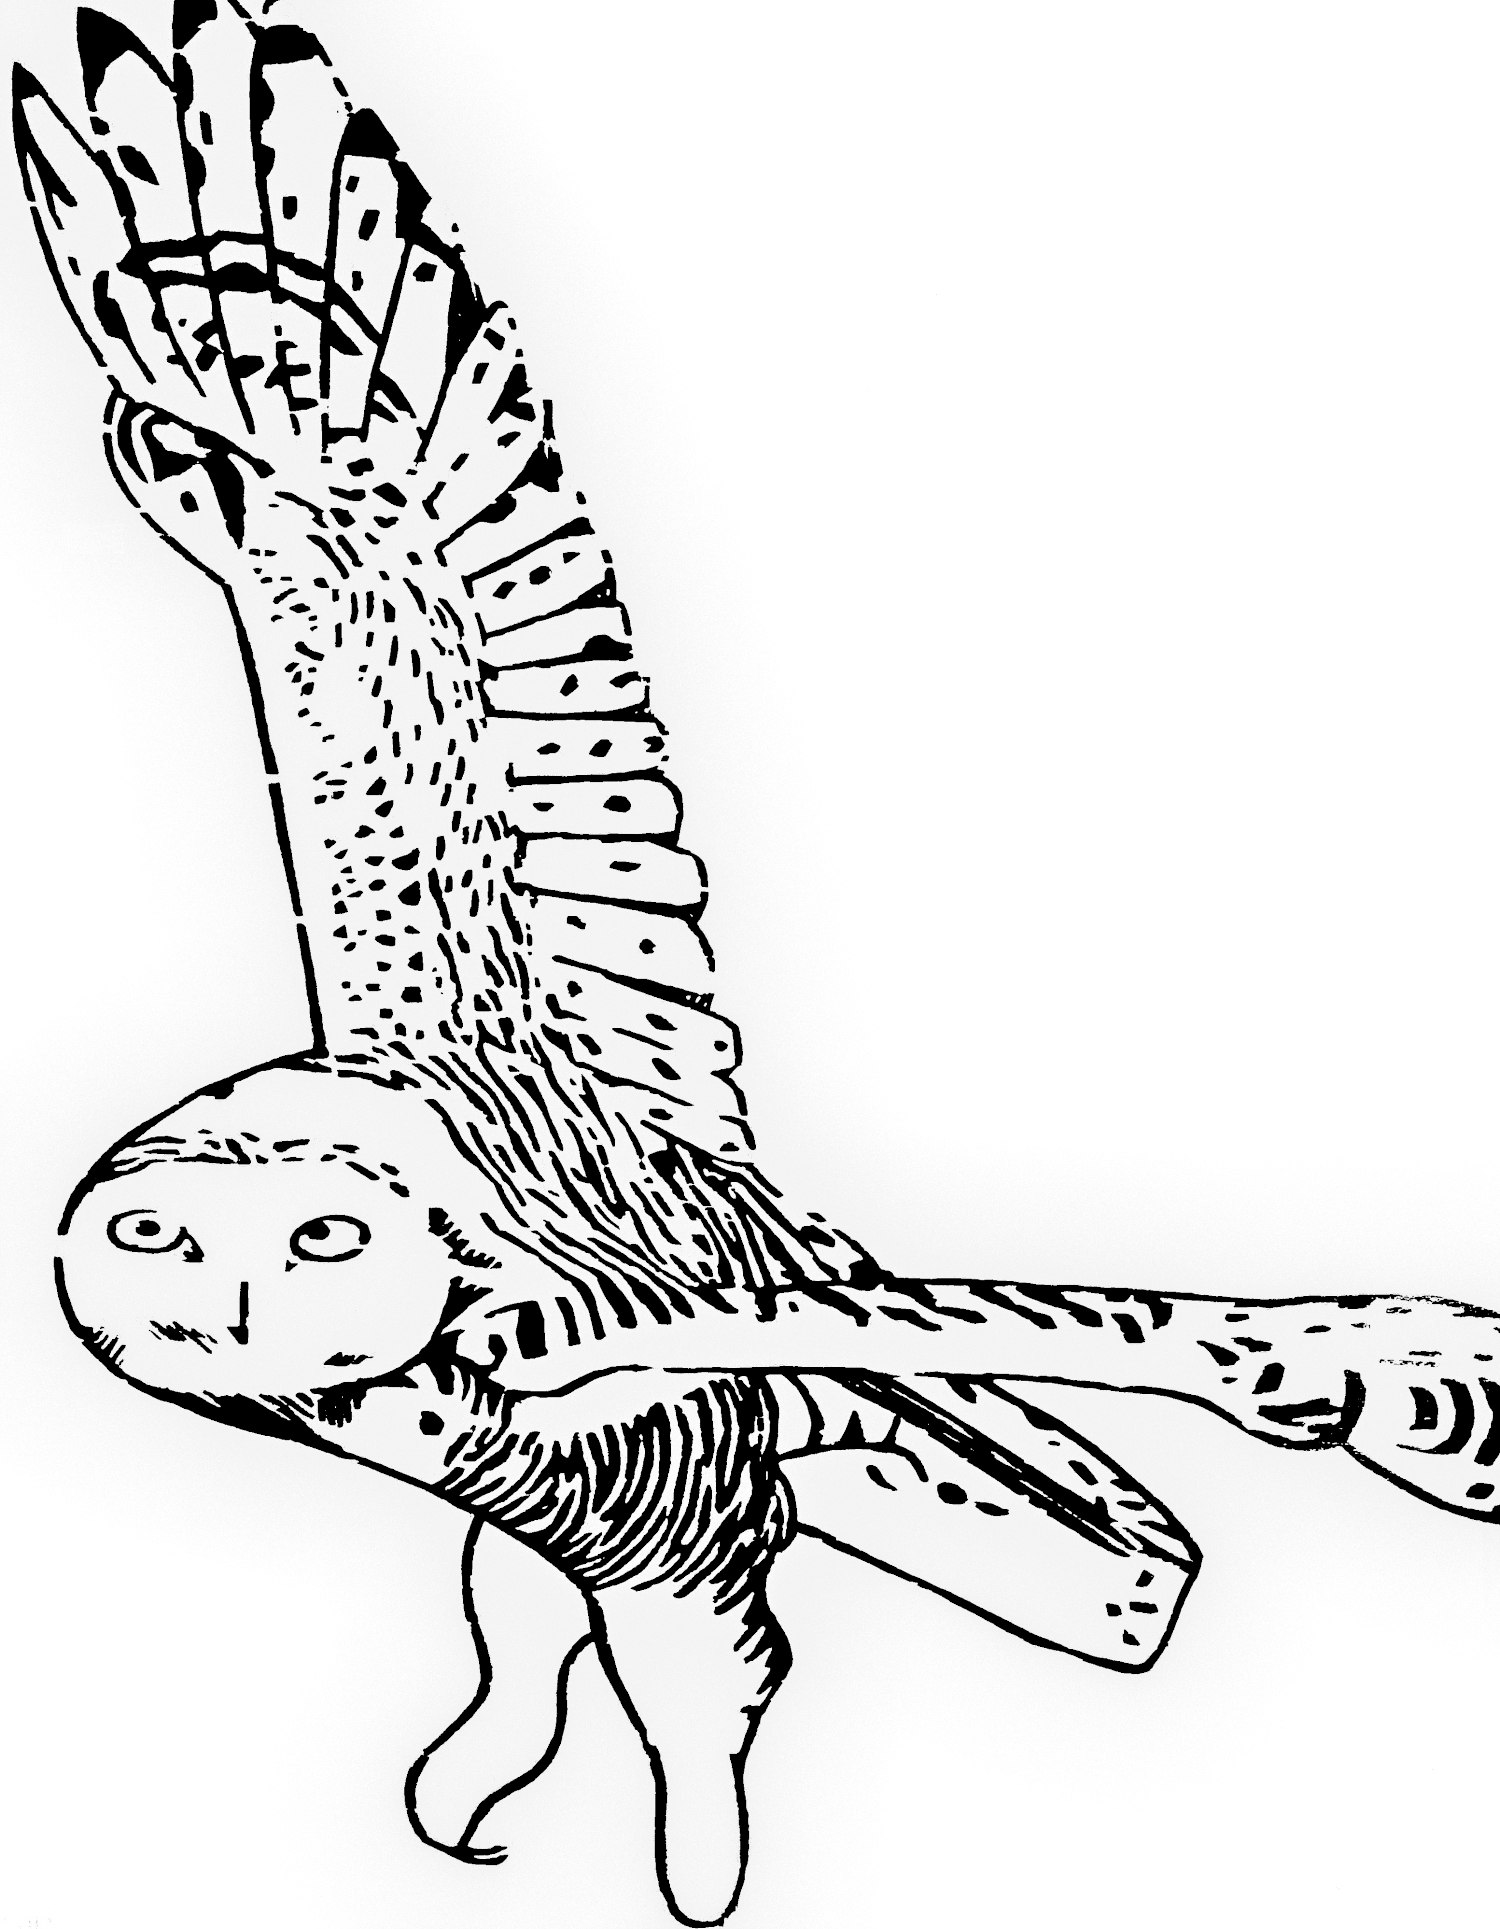 Snowy Owl white woodcut print, by Tara Marolf